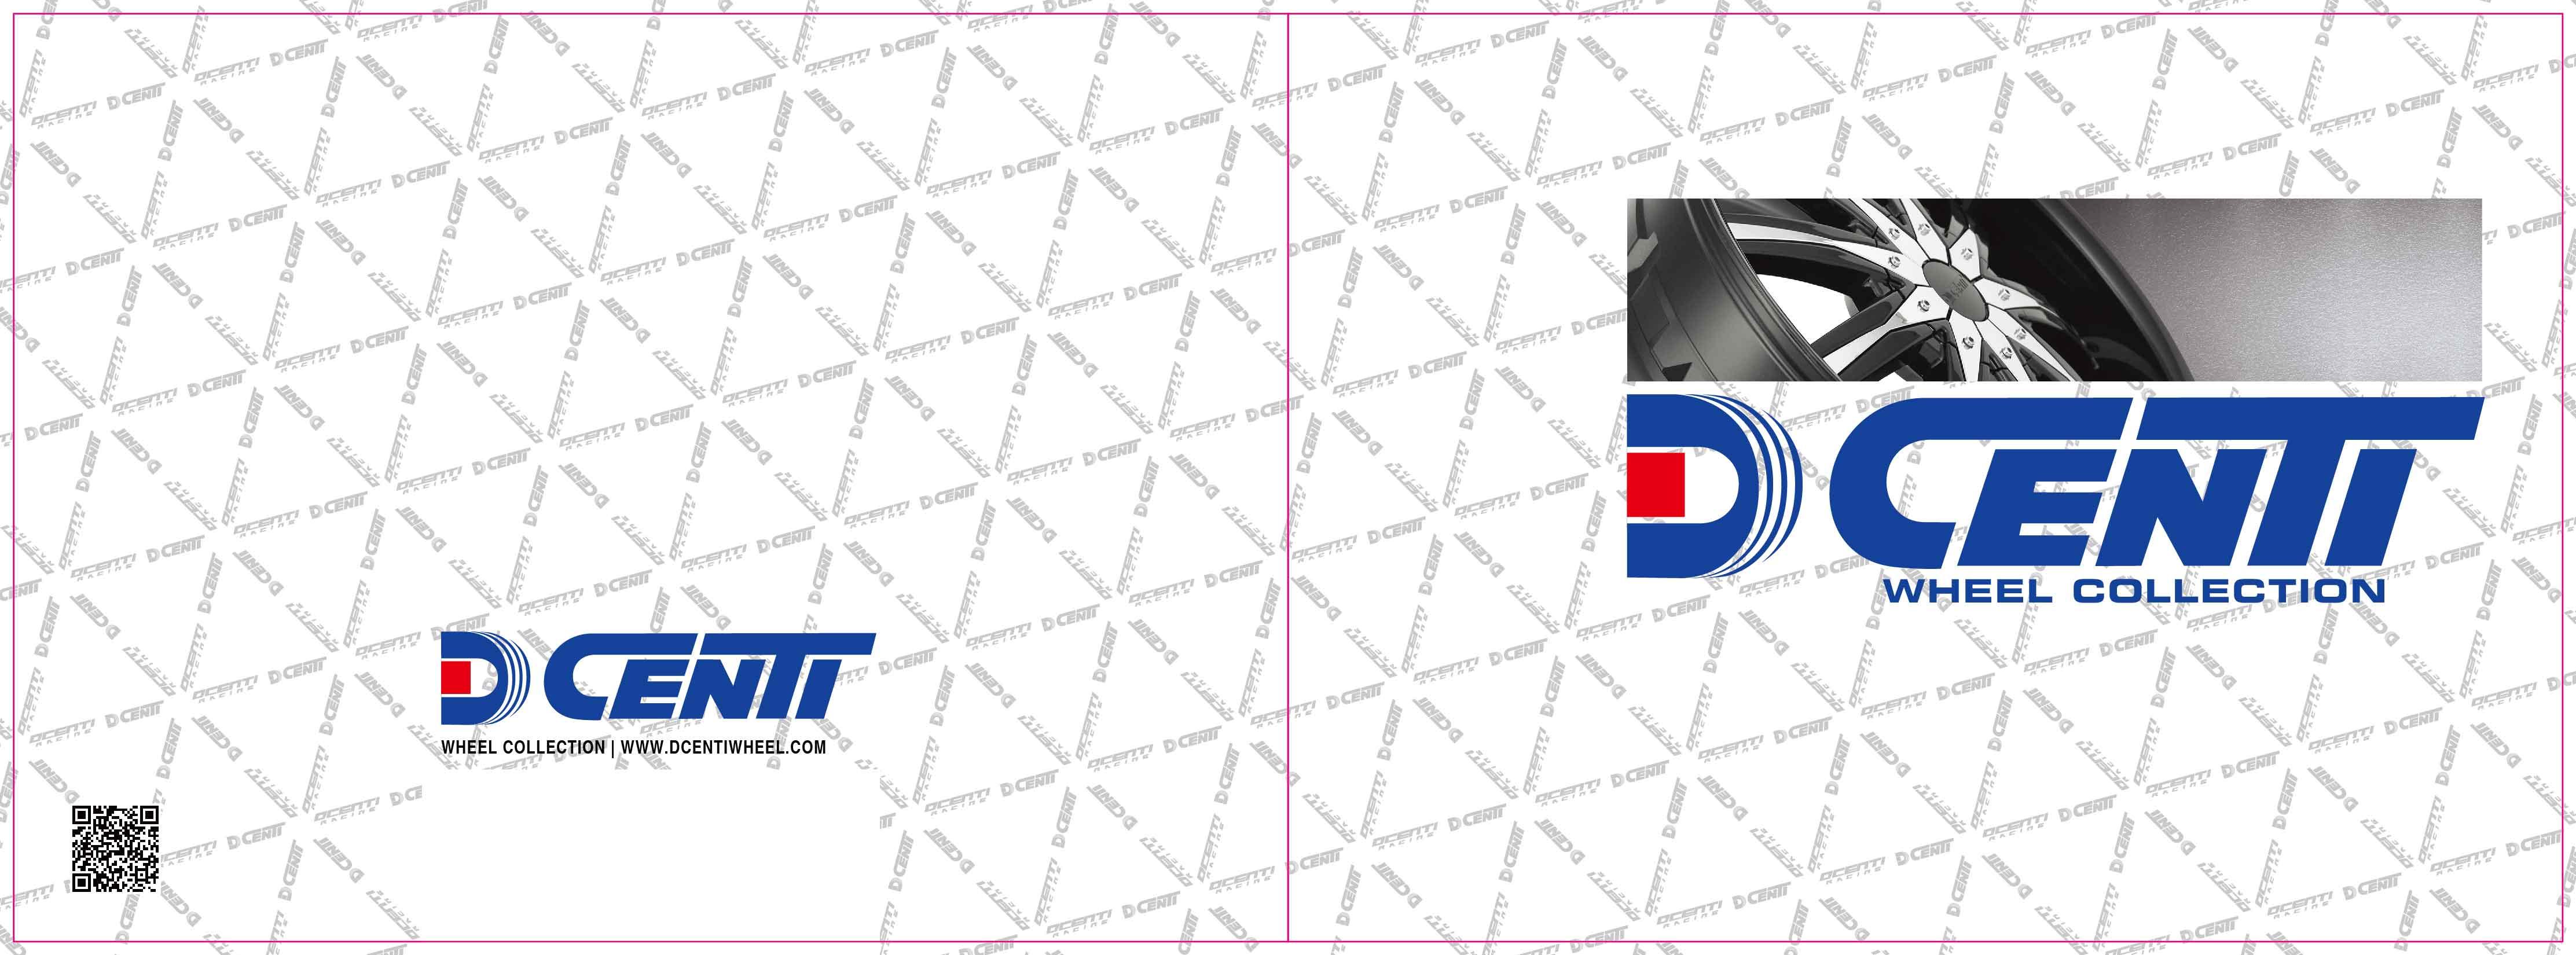 2016 Dcenti 0-0-01